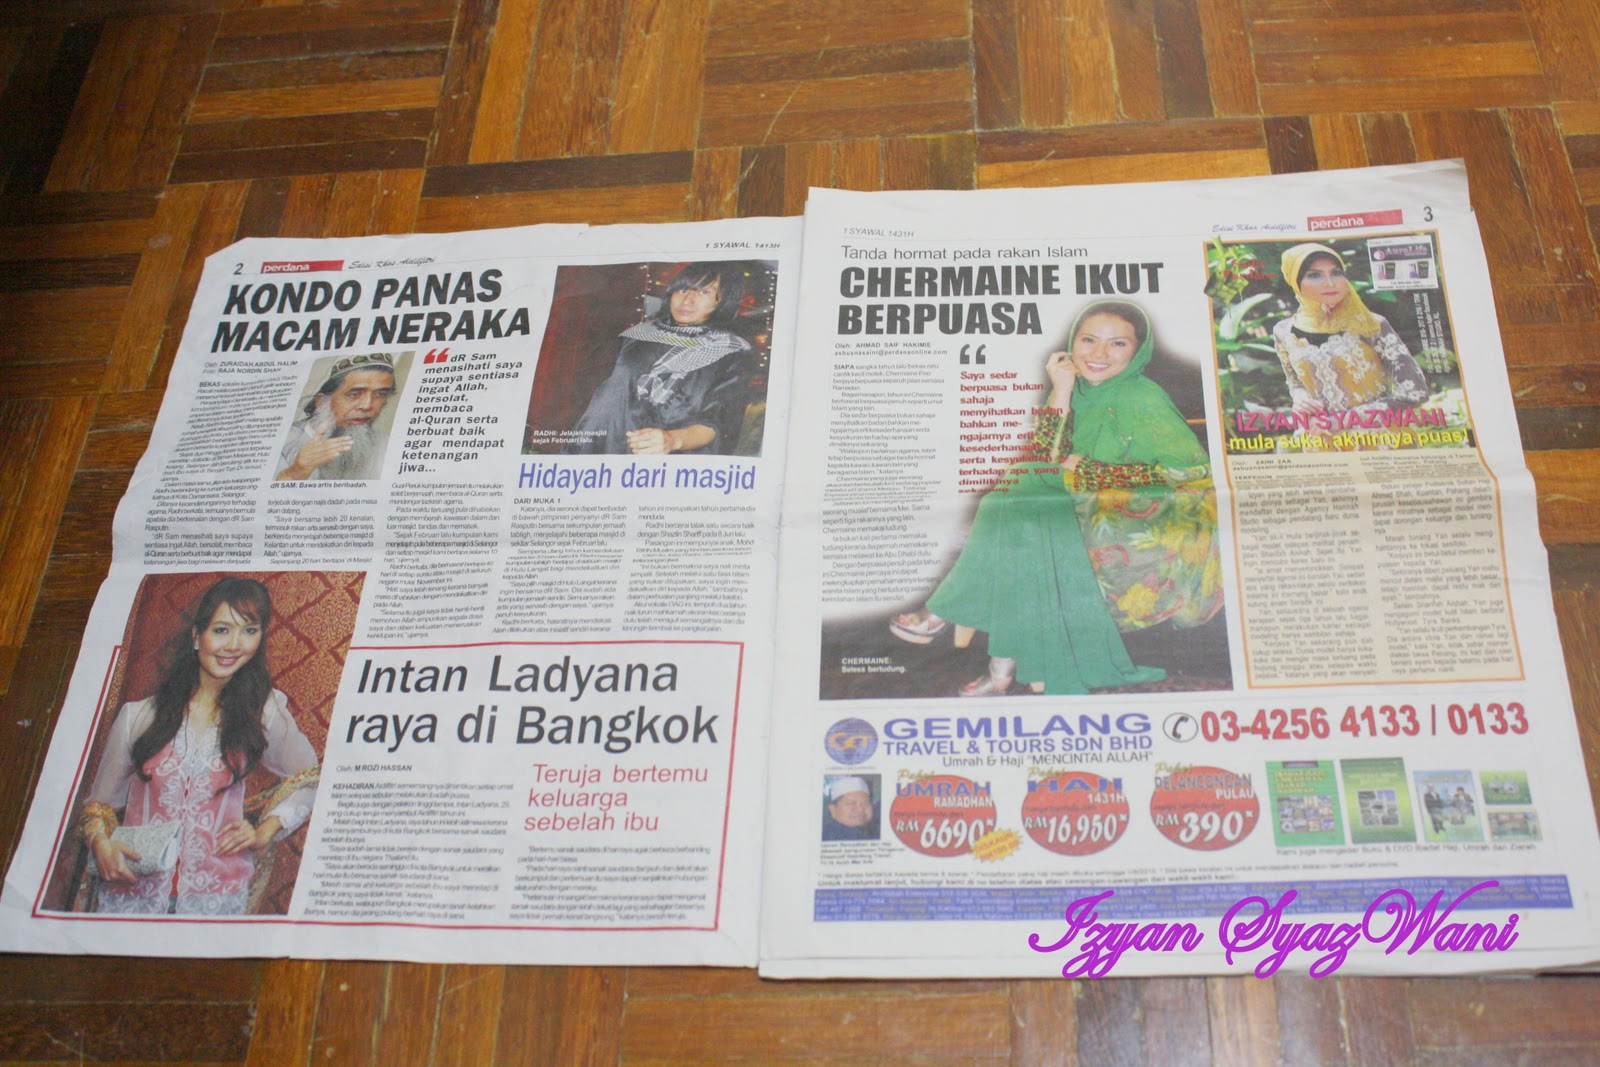 http://2.bp.blogspot.com/_lKISdXg5Alc/TQND98-LrII/AAAAAAAAAsA/O6DPZmPG8S4/s1600/IMG_0043paper.jpg